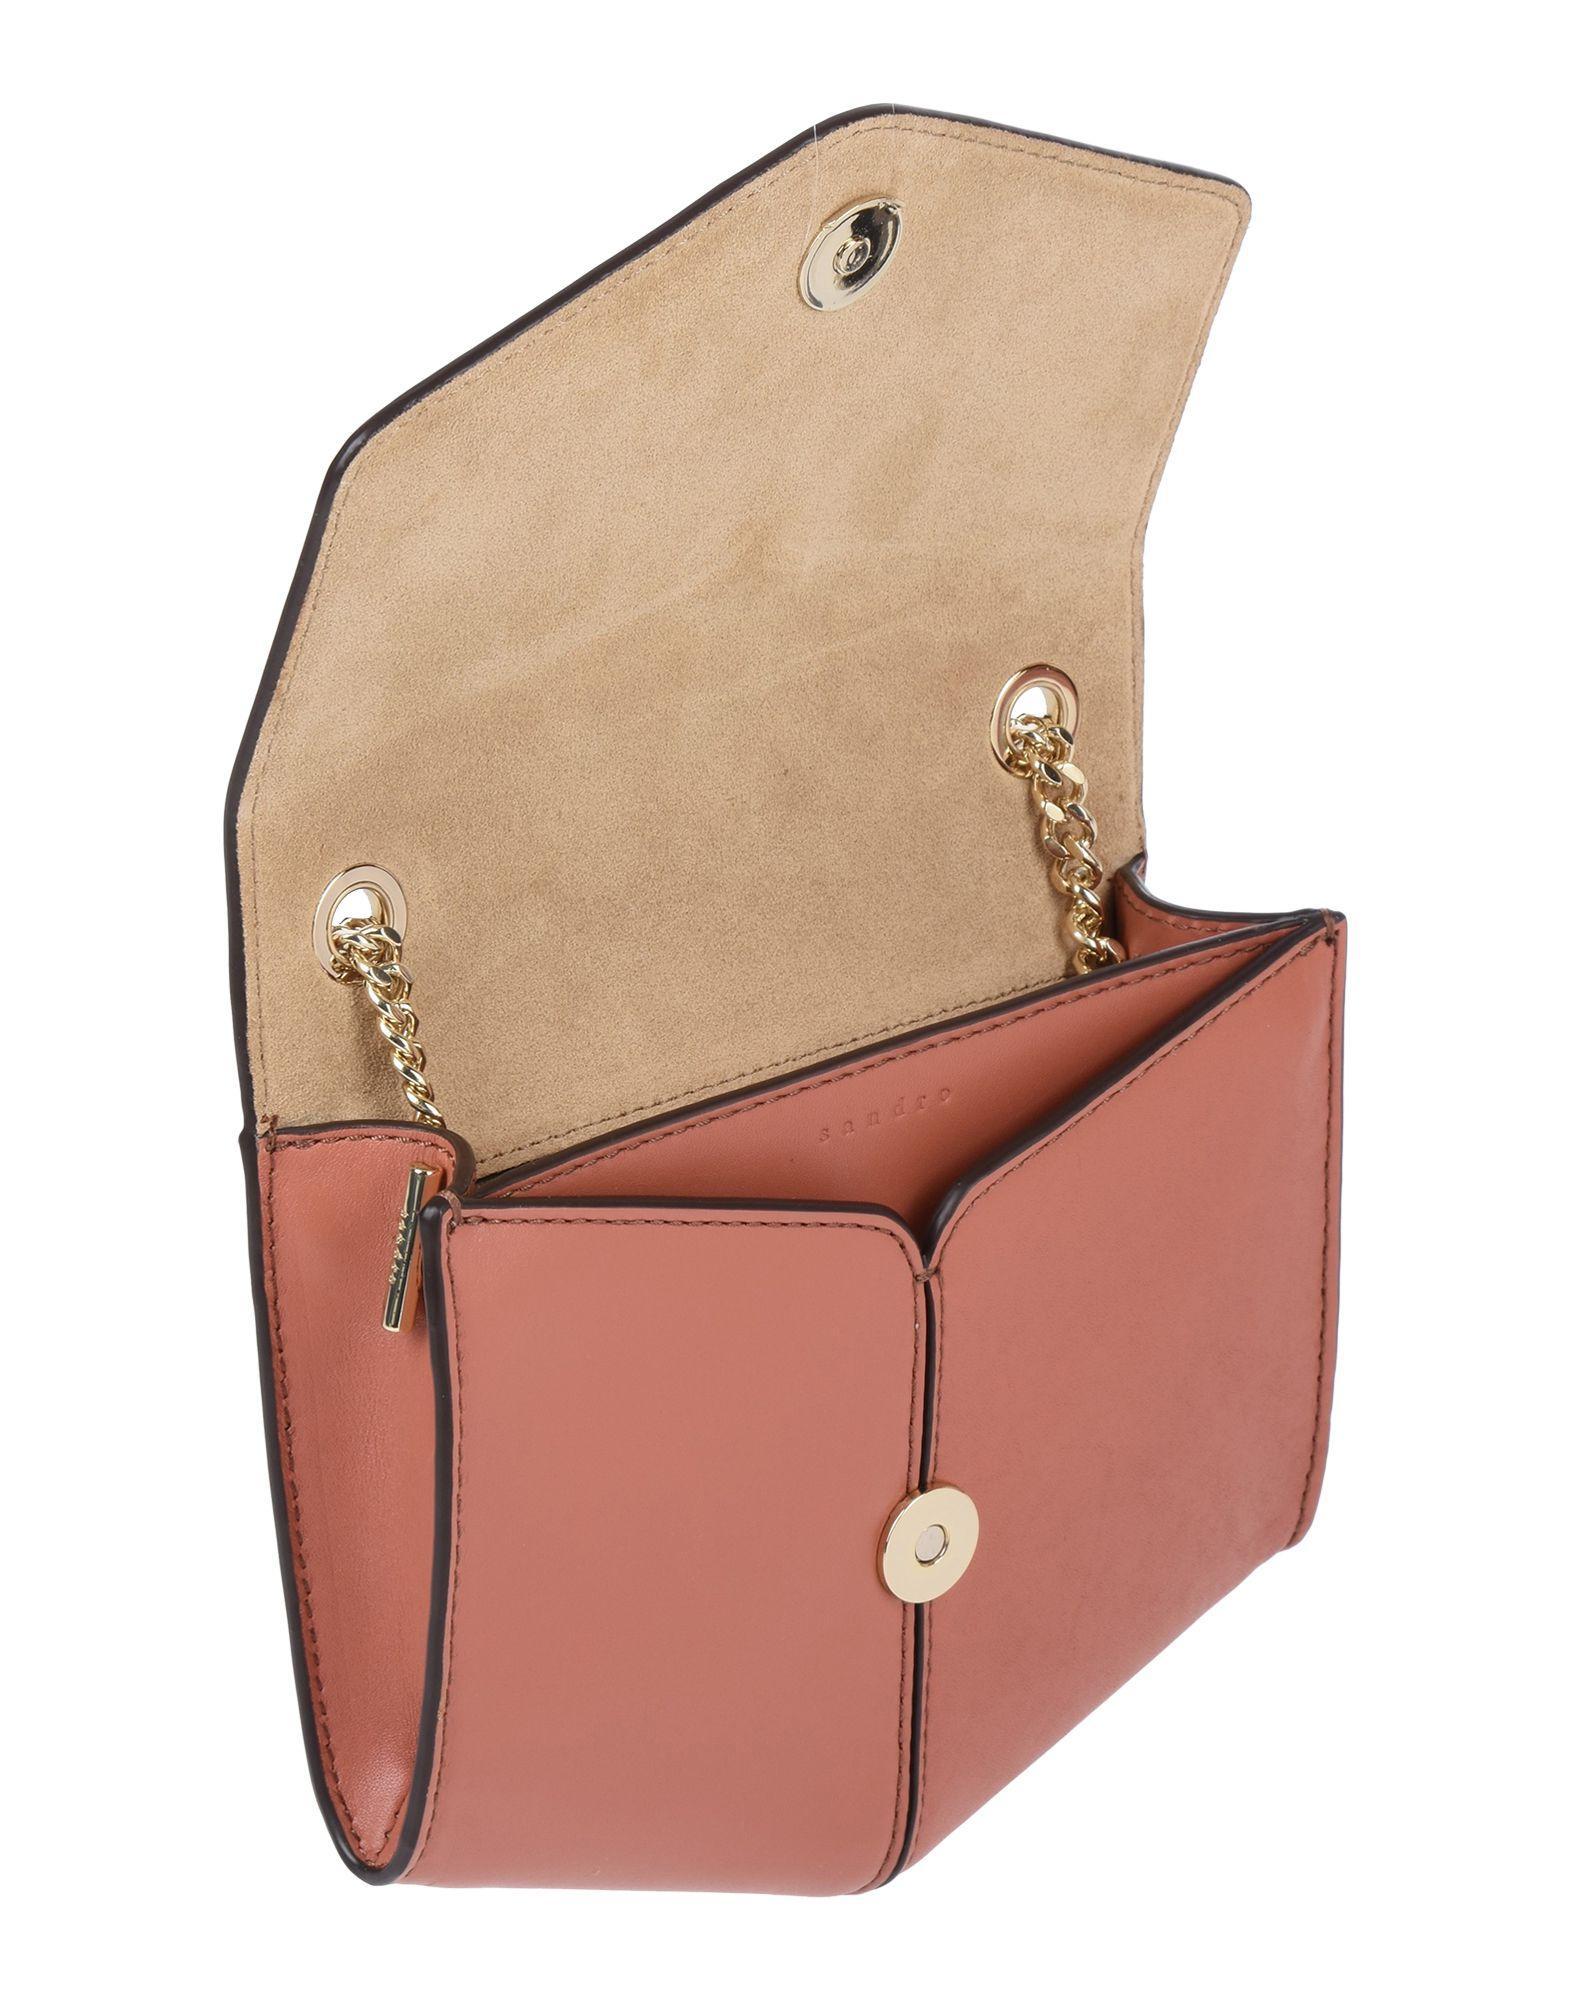 6913130c32ff Lyst - Sandro Cross-body Bag in Pink